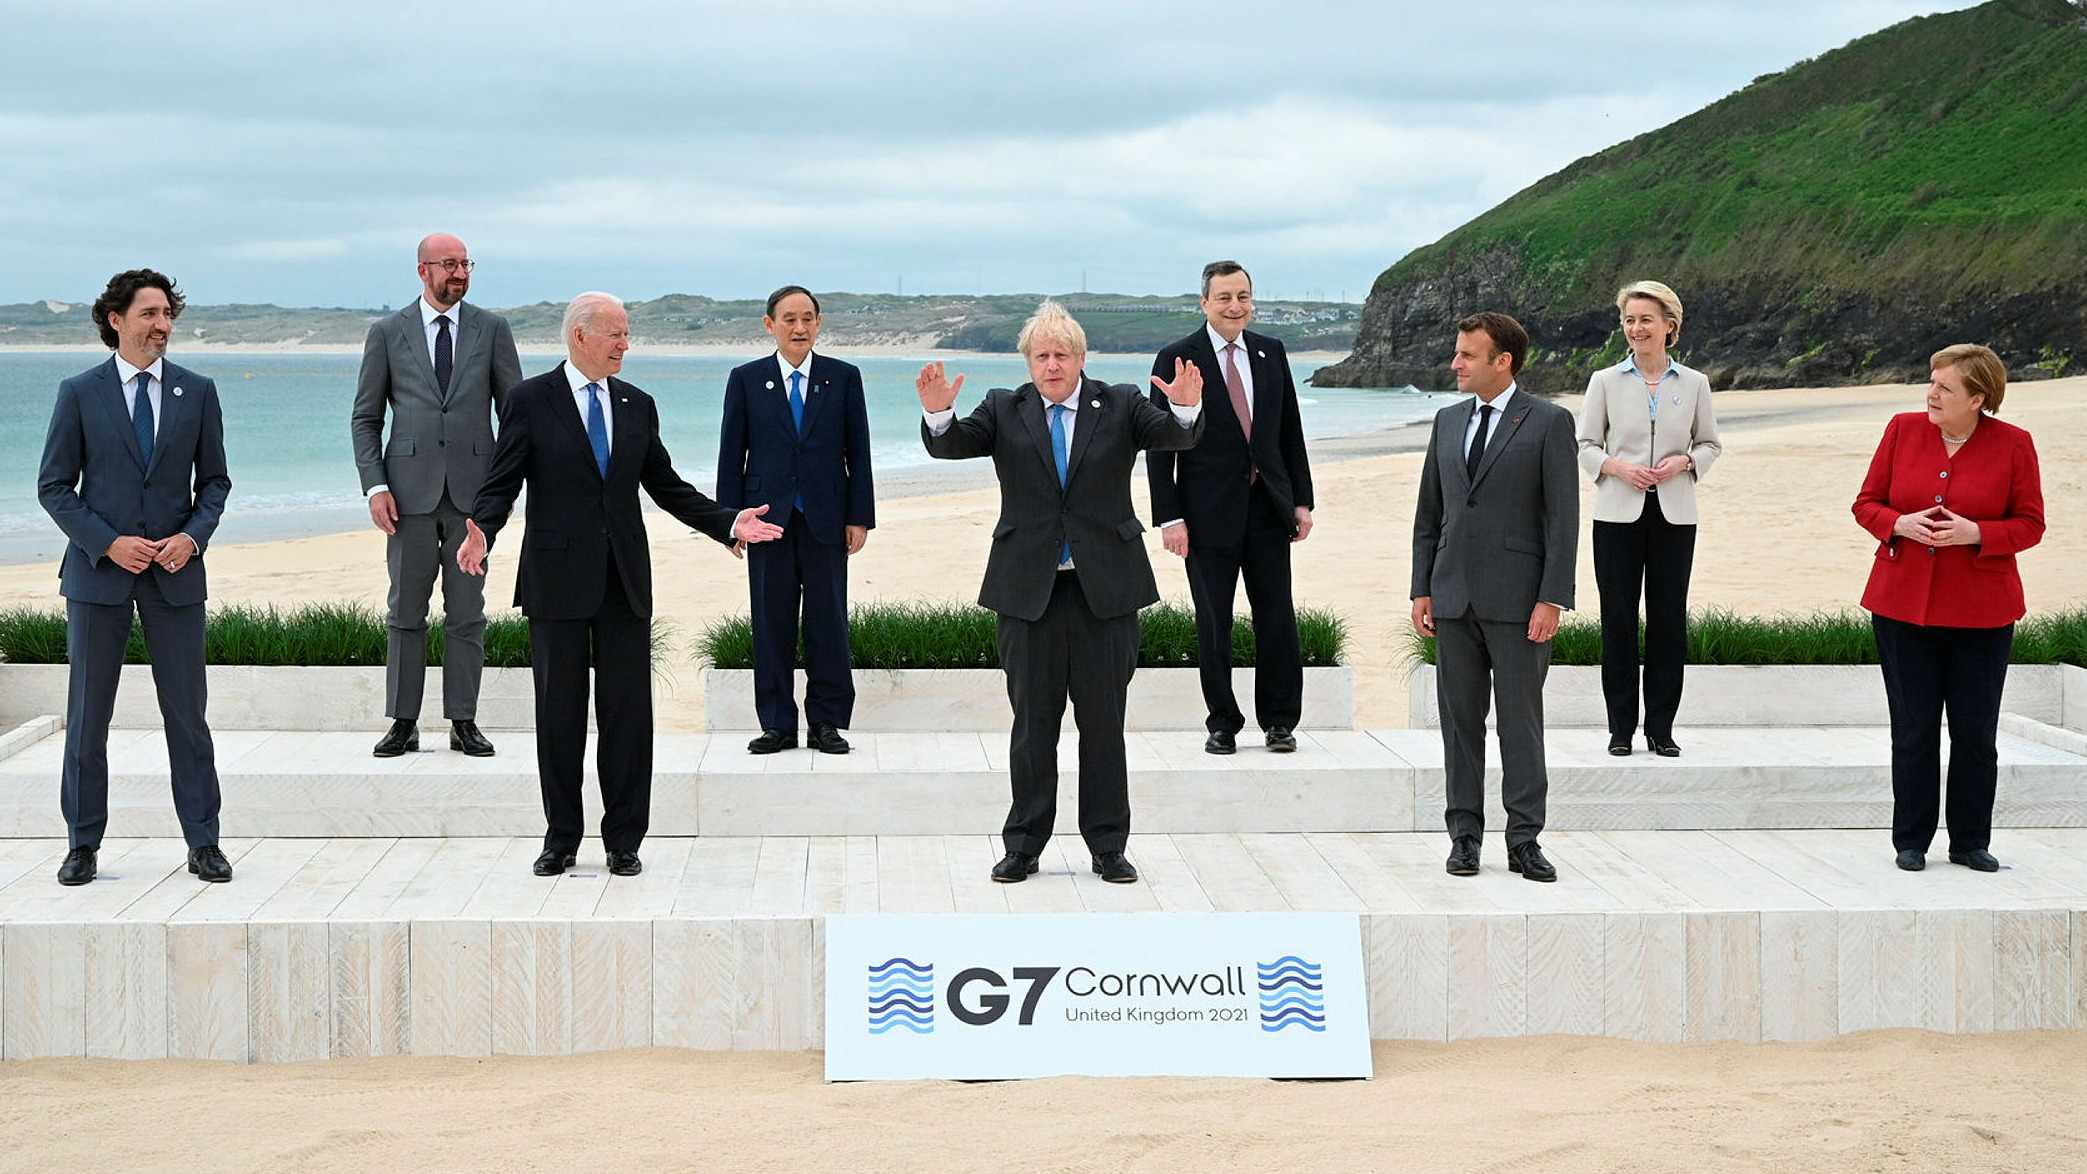 world leaders economic stimulus biden